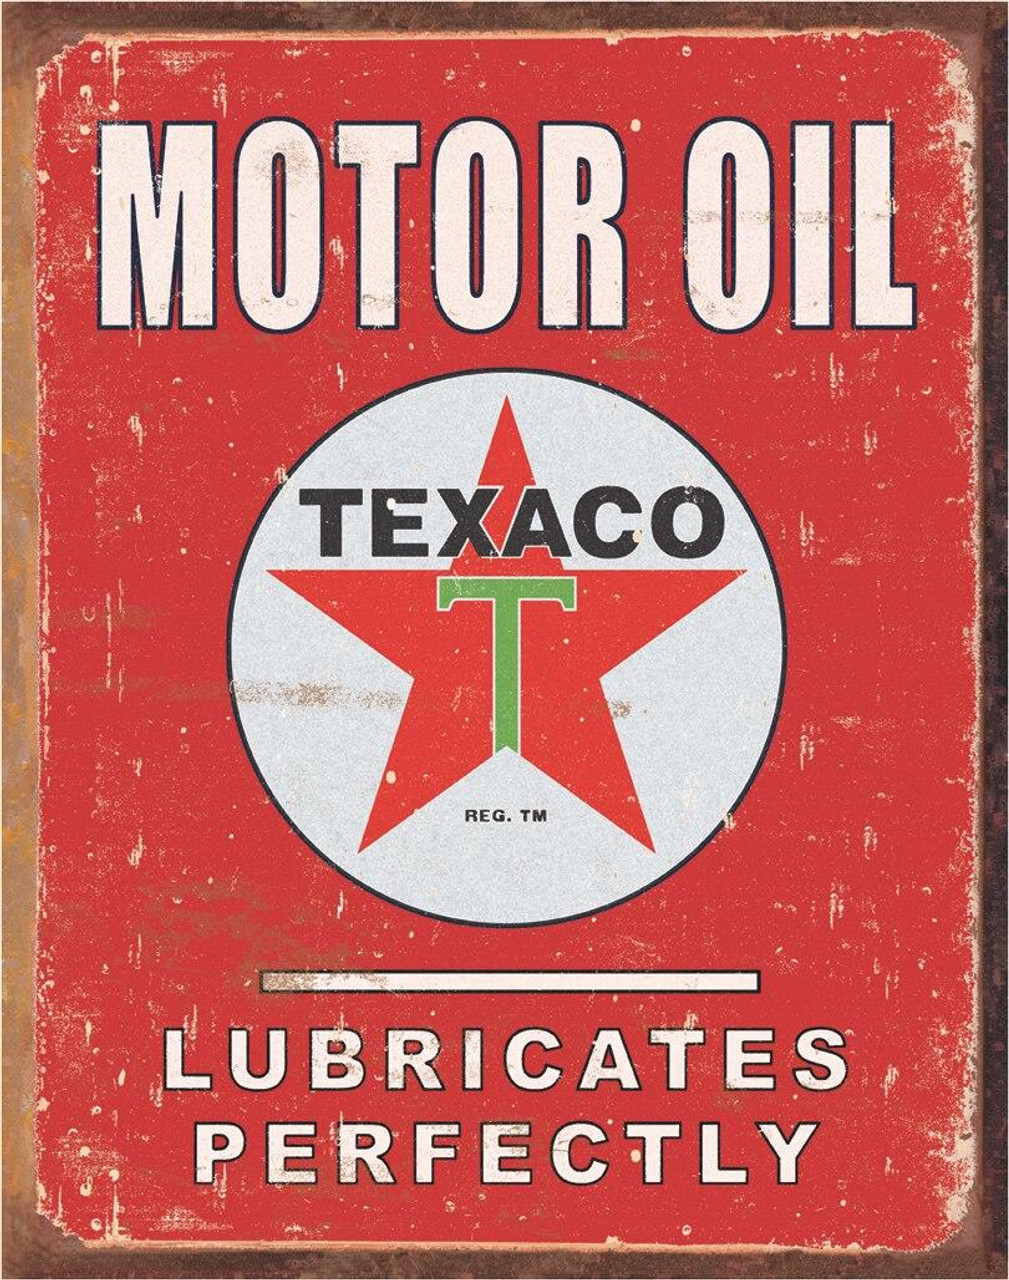 Texaco Texaco - Lubricates Perfectly